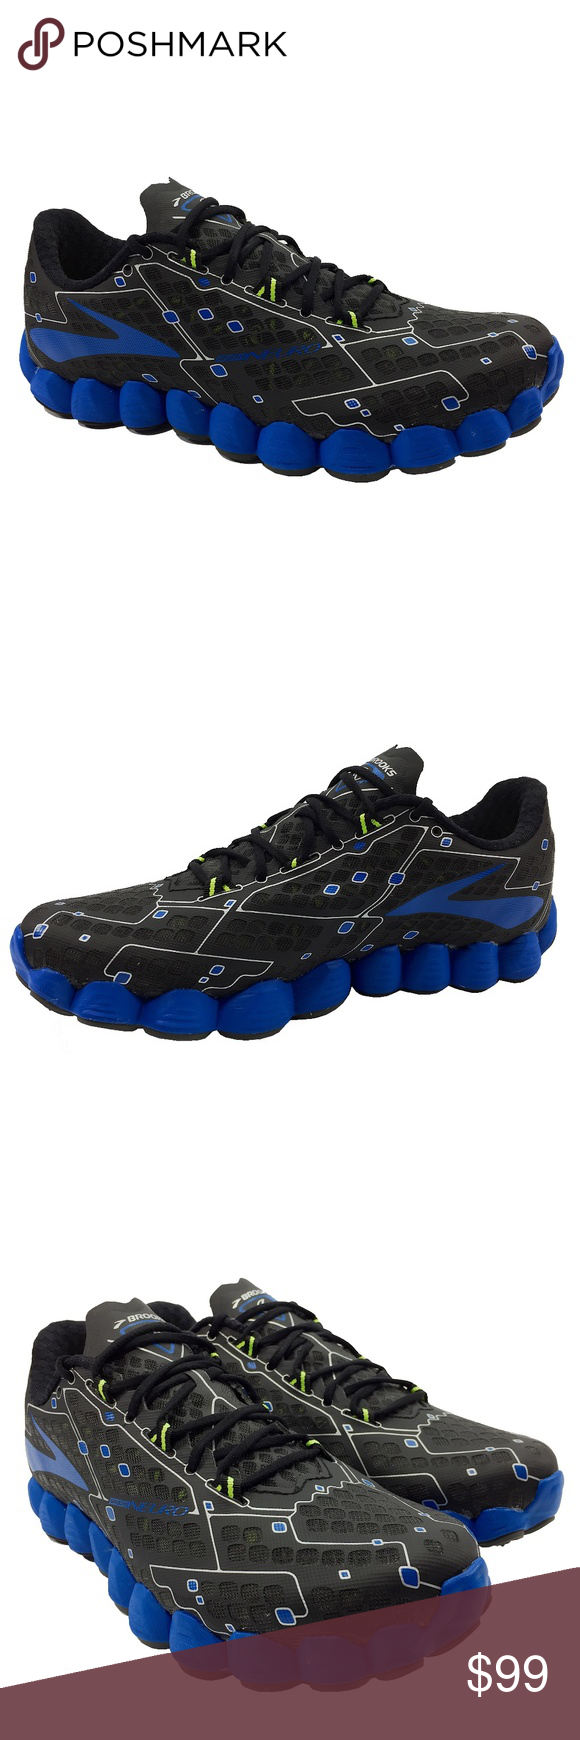 0db6f260039 Brooks NEURO Mens Running Cross Training Shoes Brooks Men s Neuro Running  Shoe Size 11.5 Gender